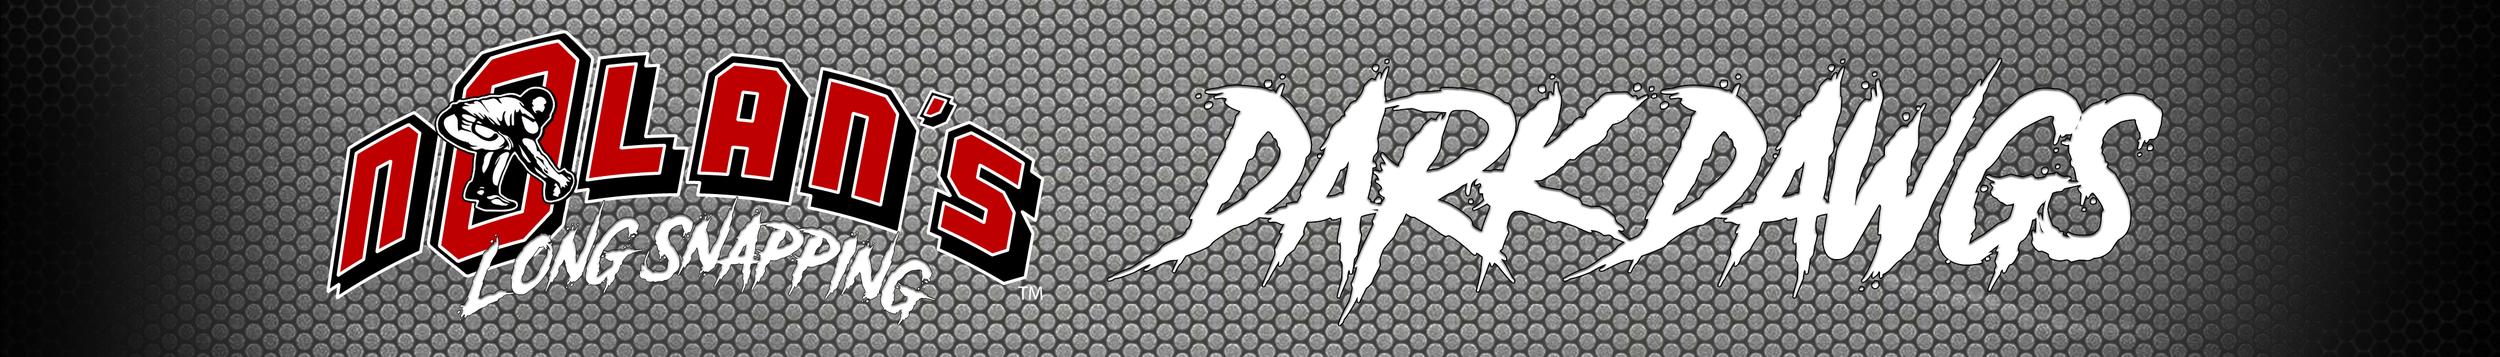 Nolan's-DARK-Dawgs-Banner-2.png